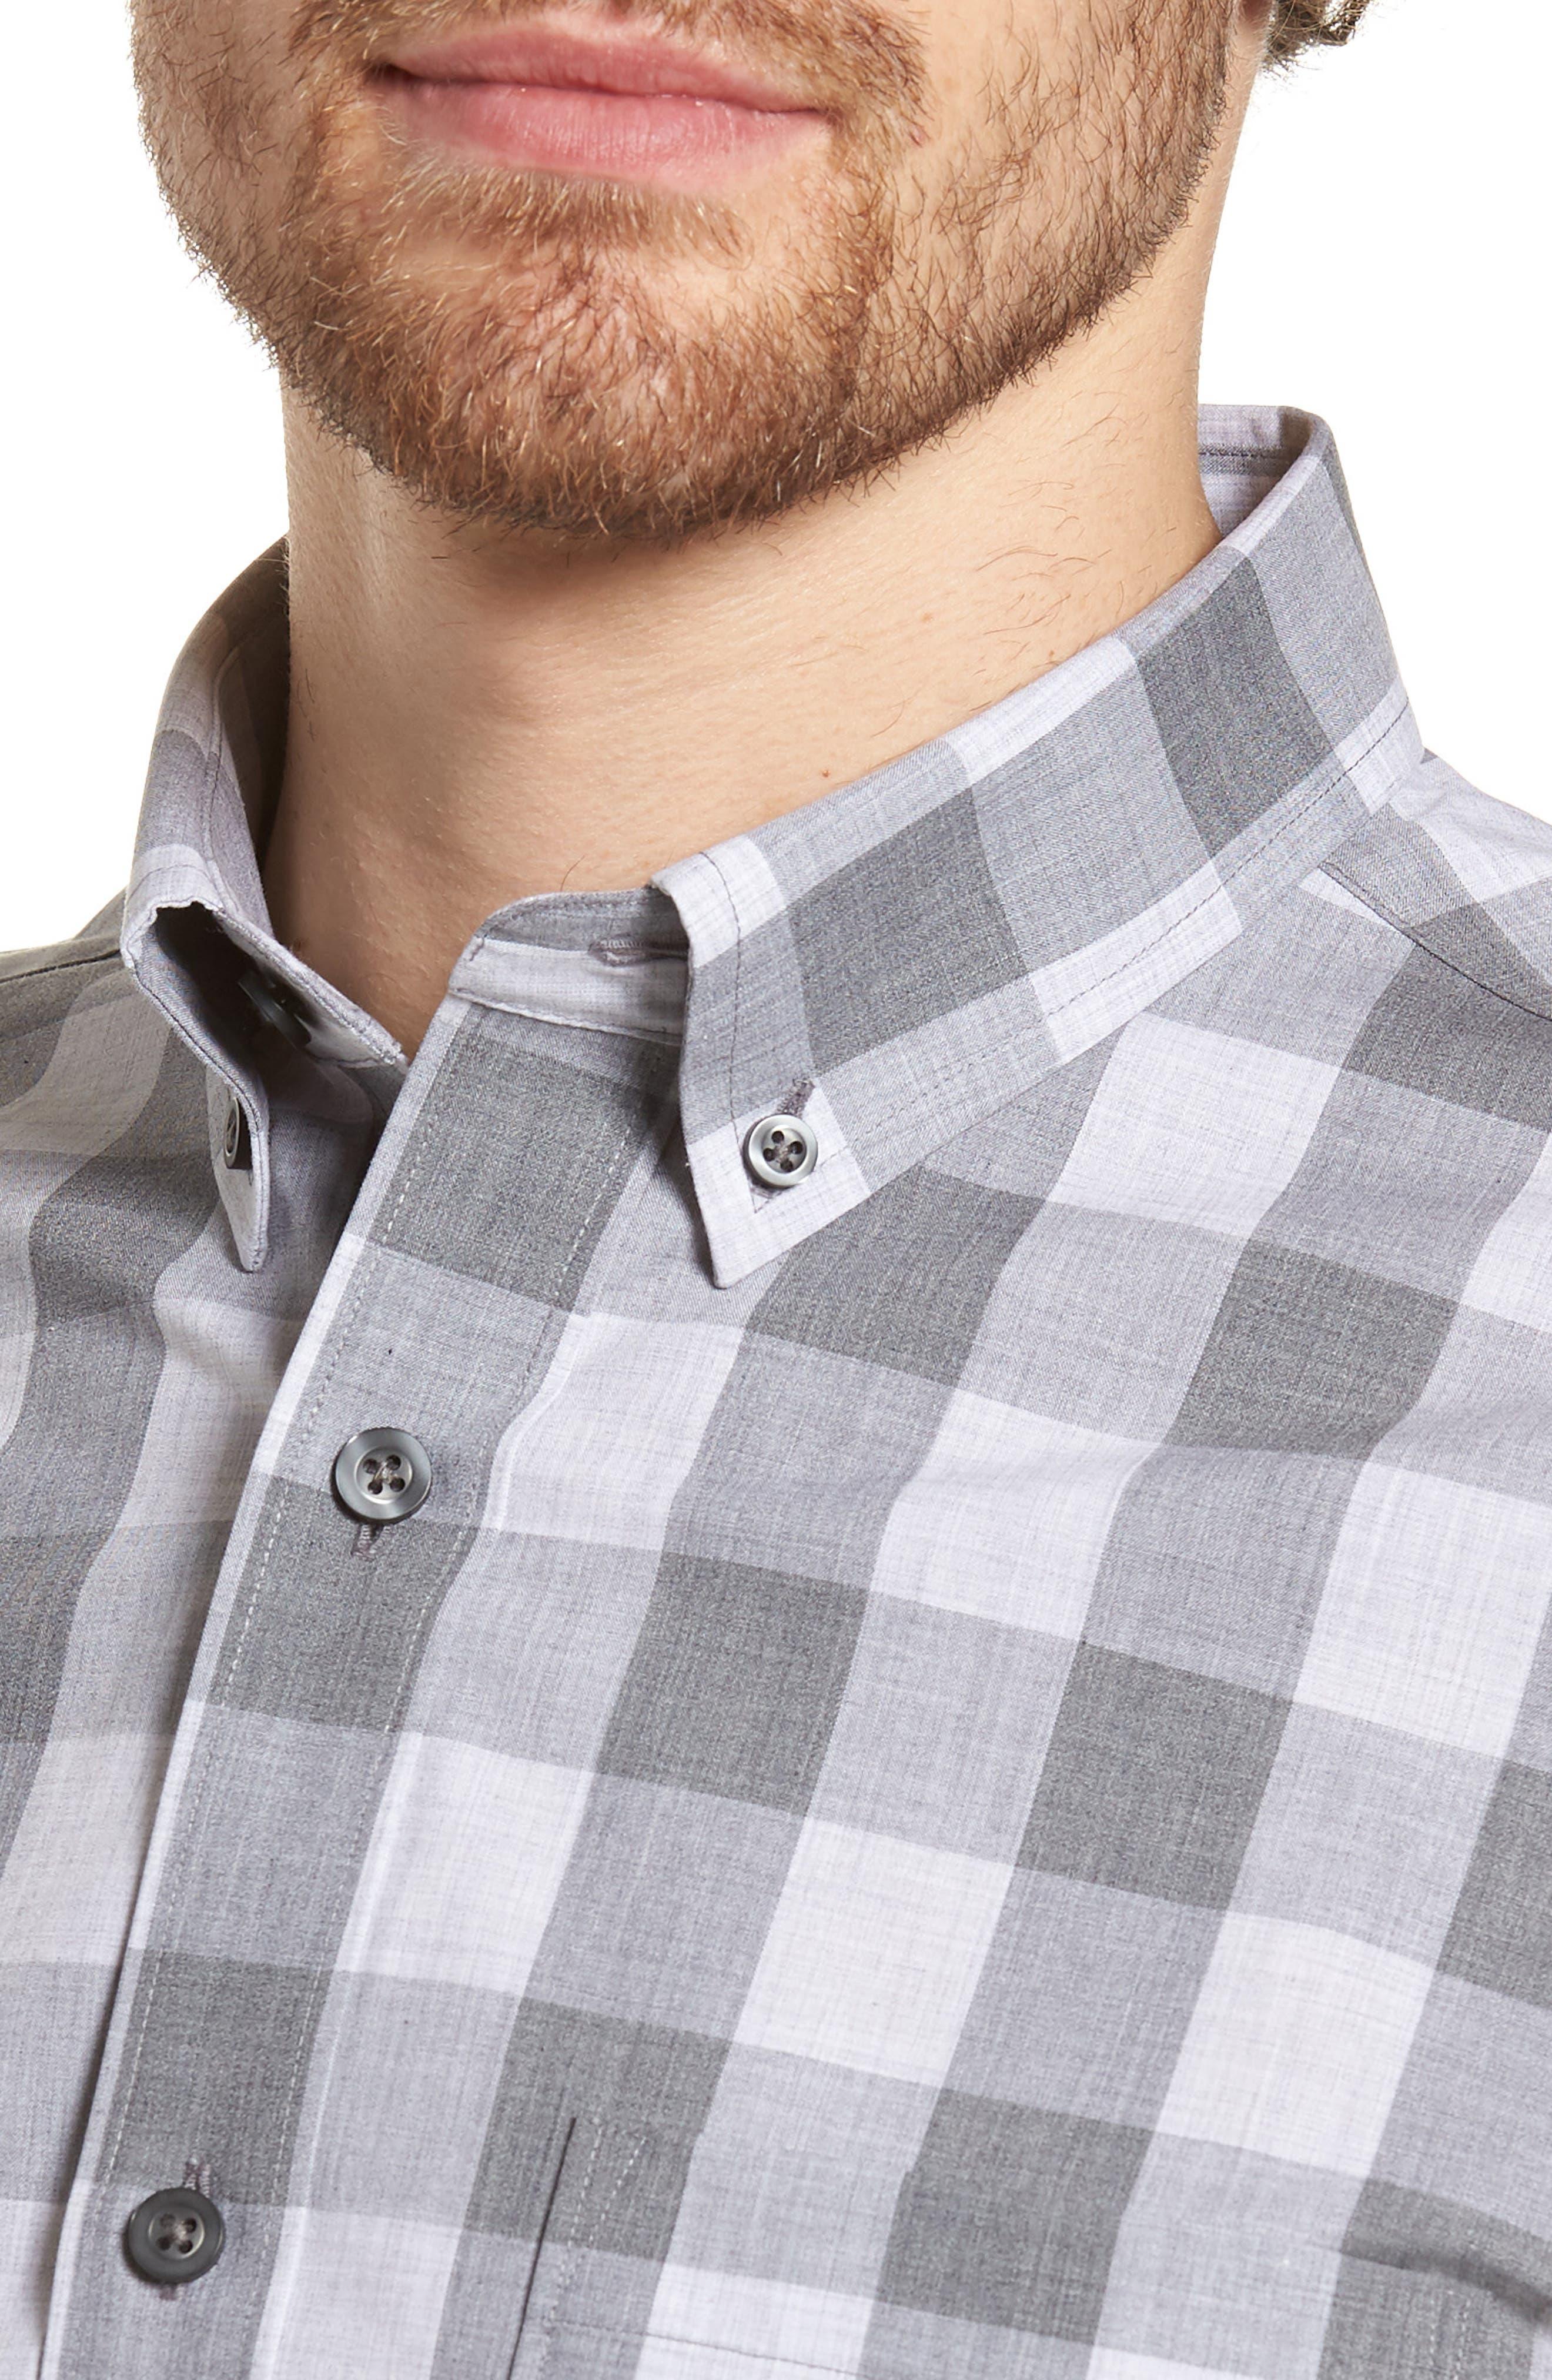 Trim Fit Check Sport Shirt,                             Alternate thumbnail 2, color,                             Grey Shade Buffalo